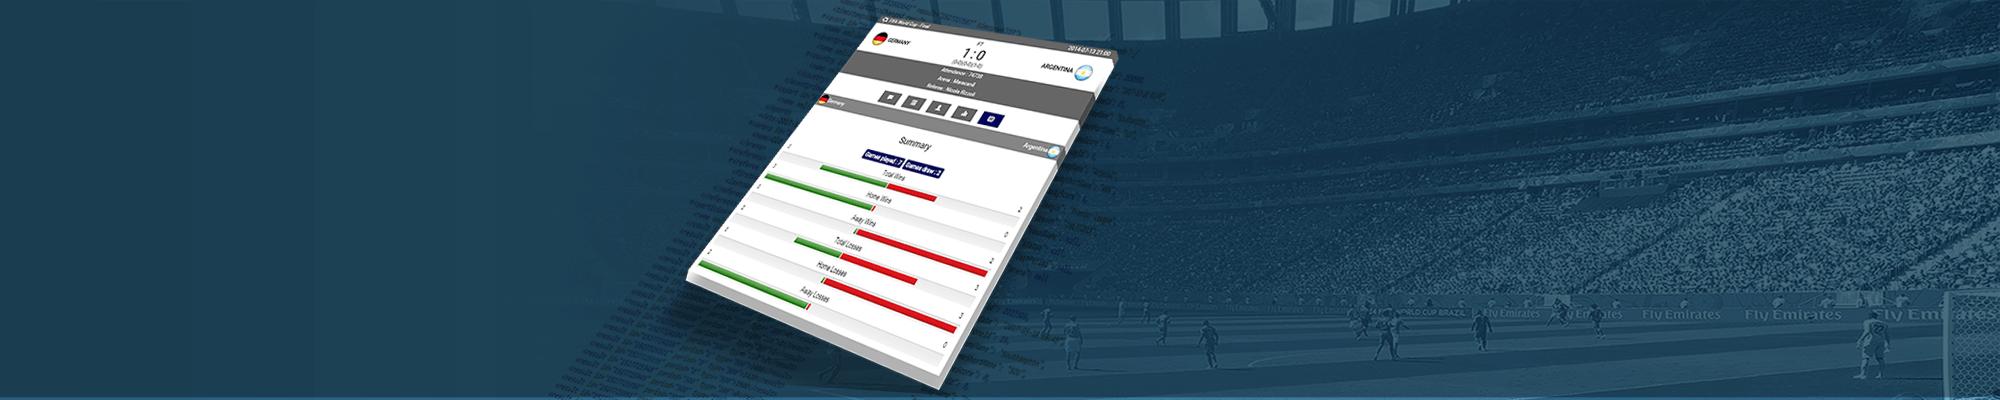 Sports Data XML Feed & API, Livescore, Fixtures, Latest Scores - Score24